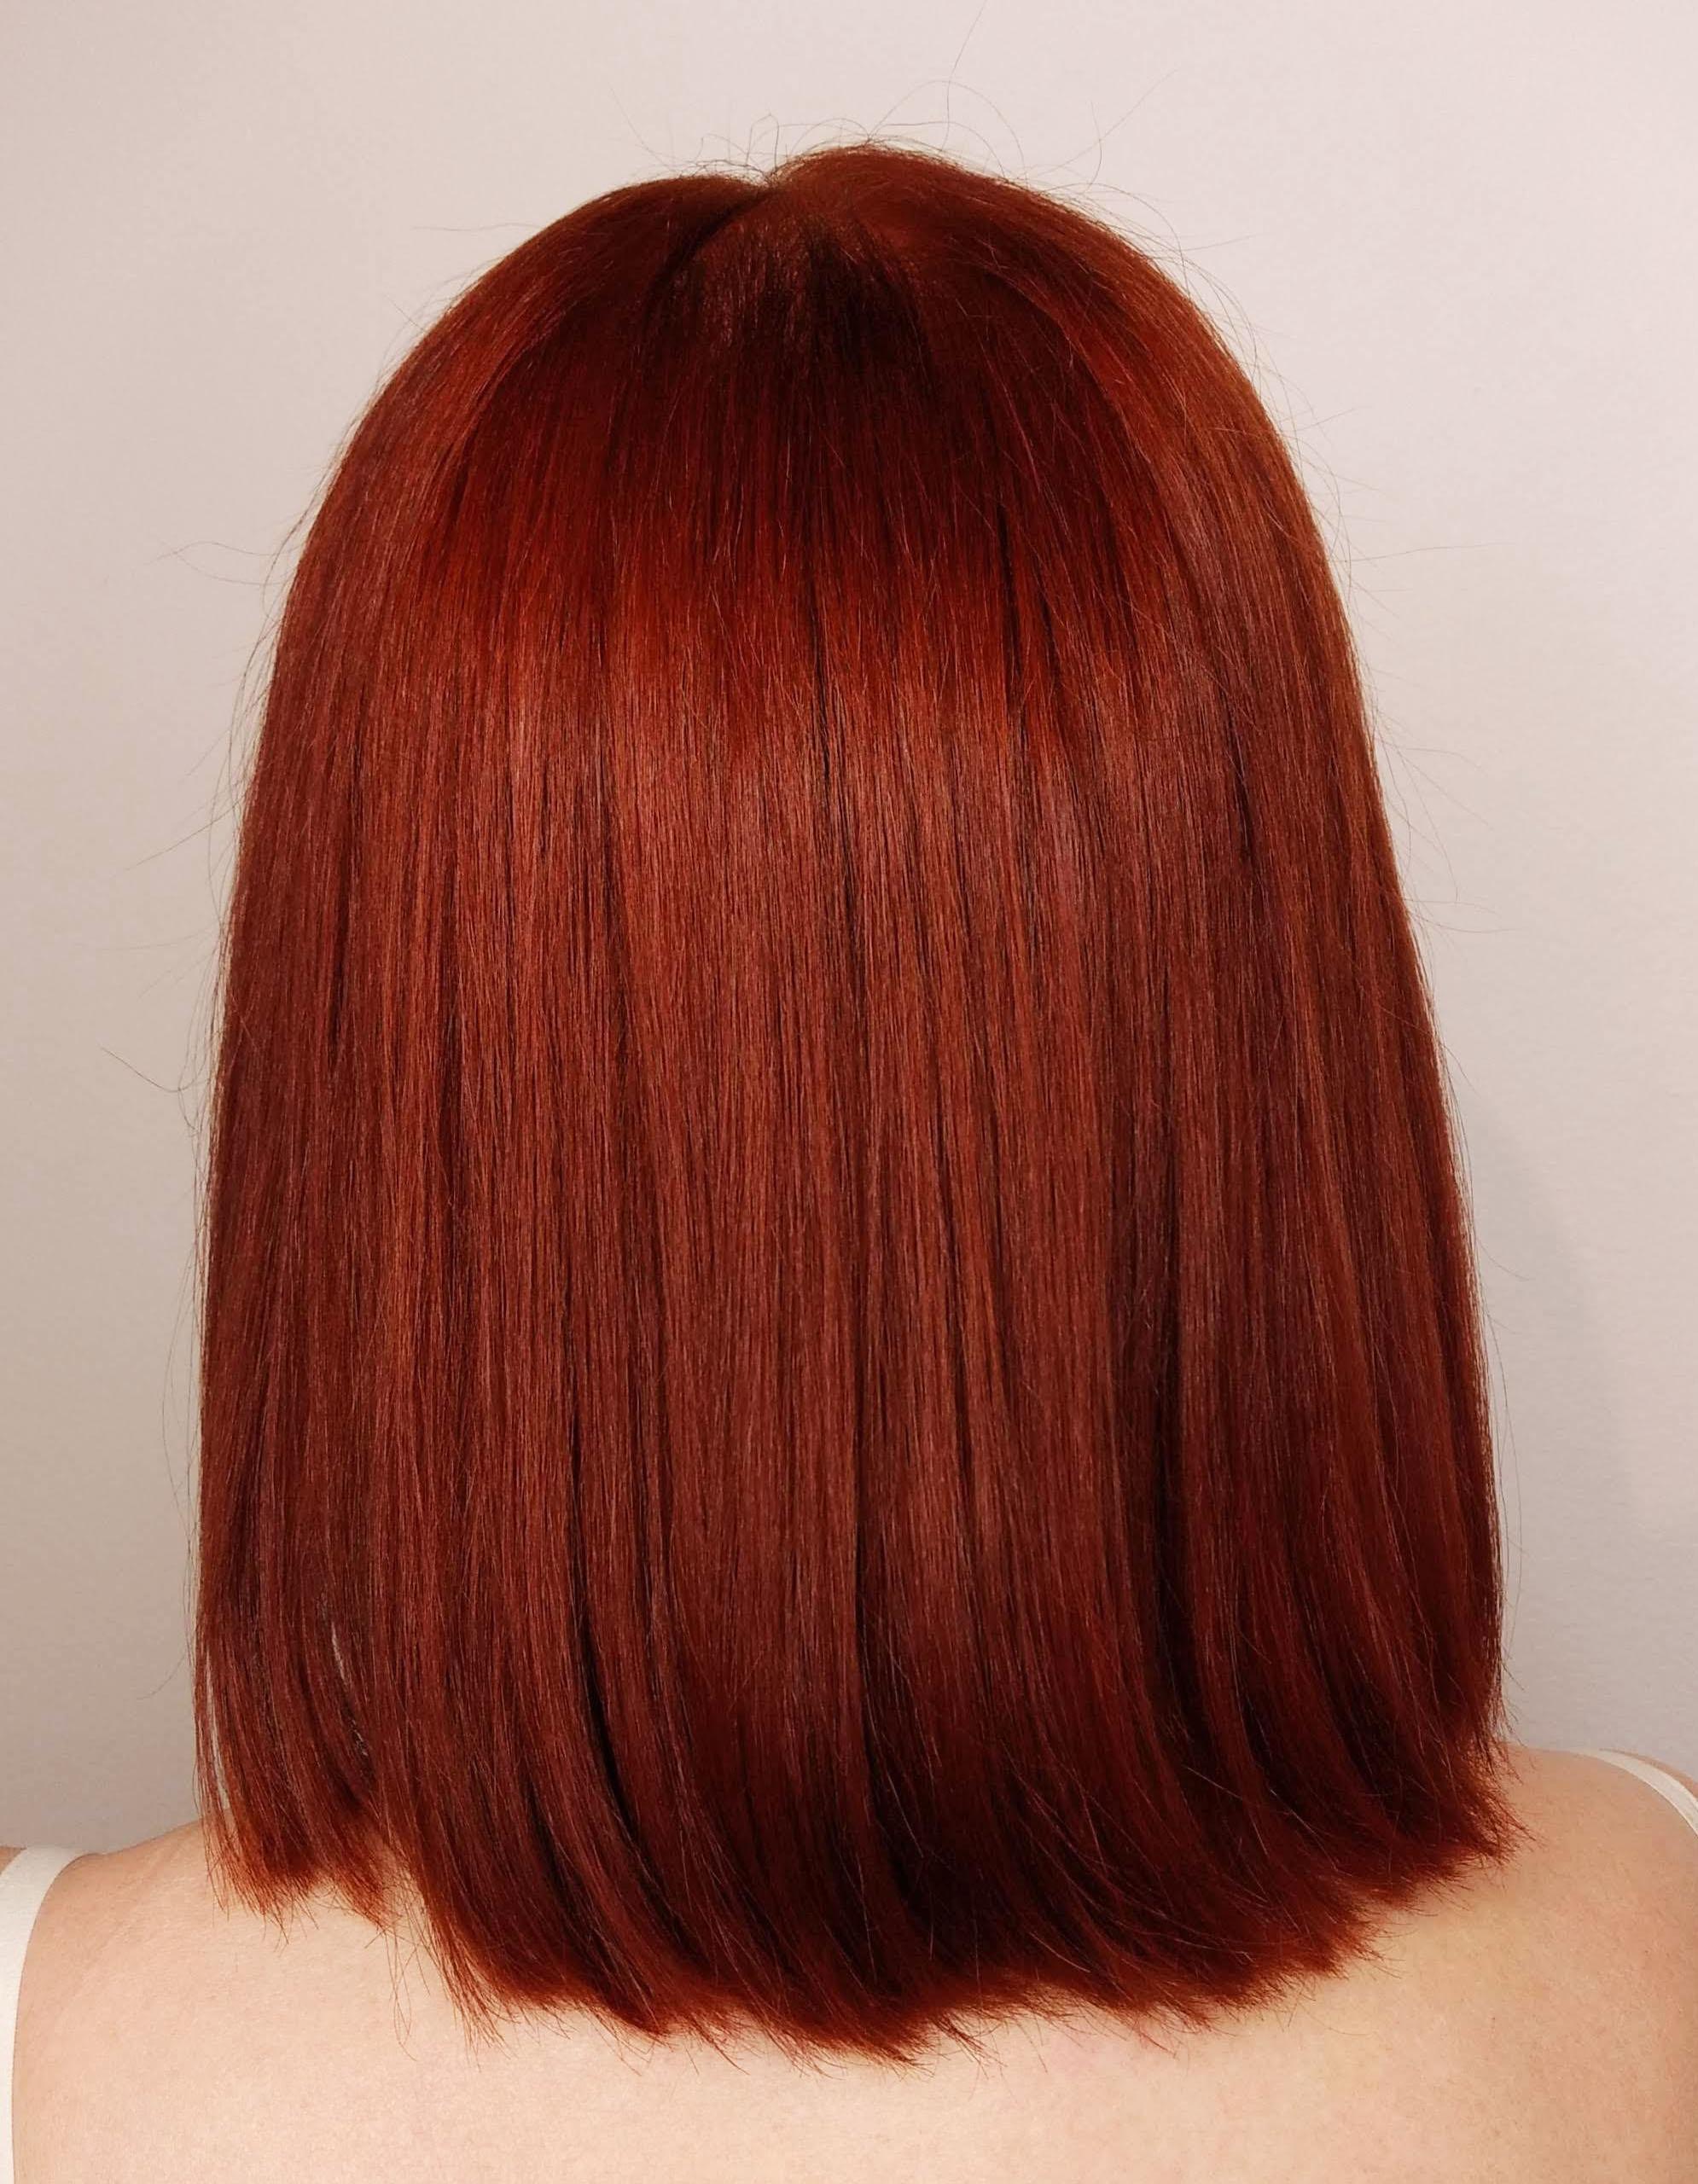 auburn-hair-dye-chicago